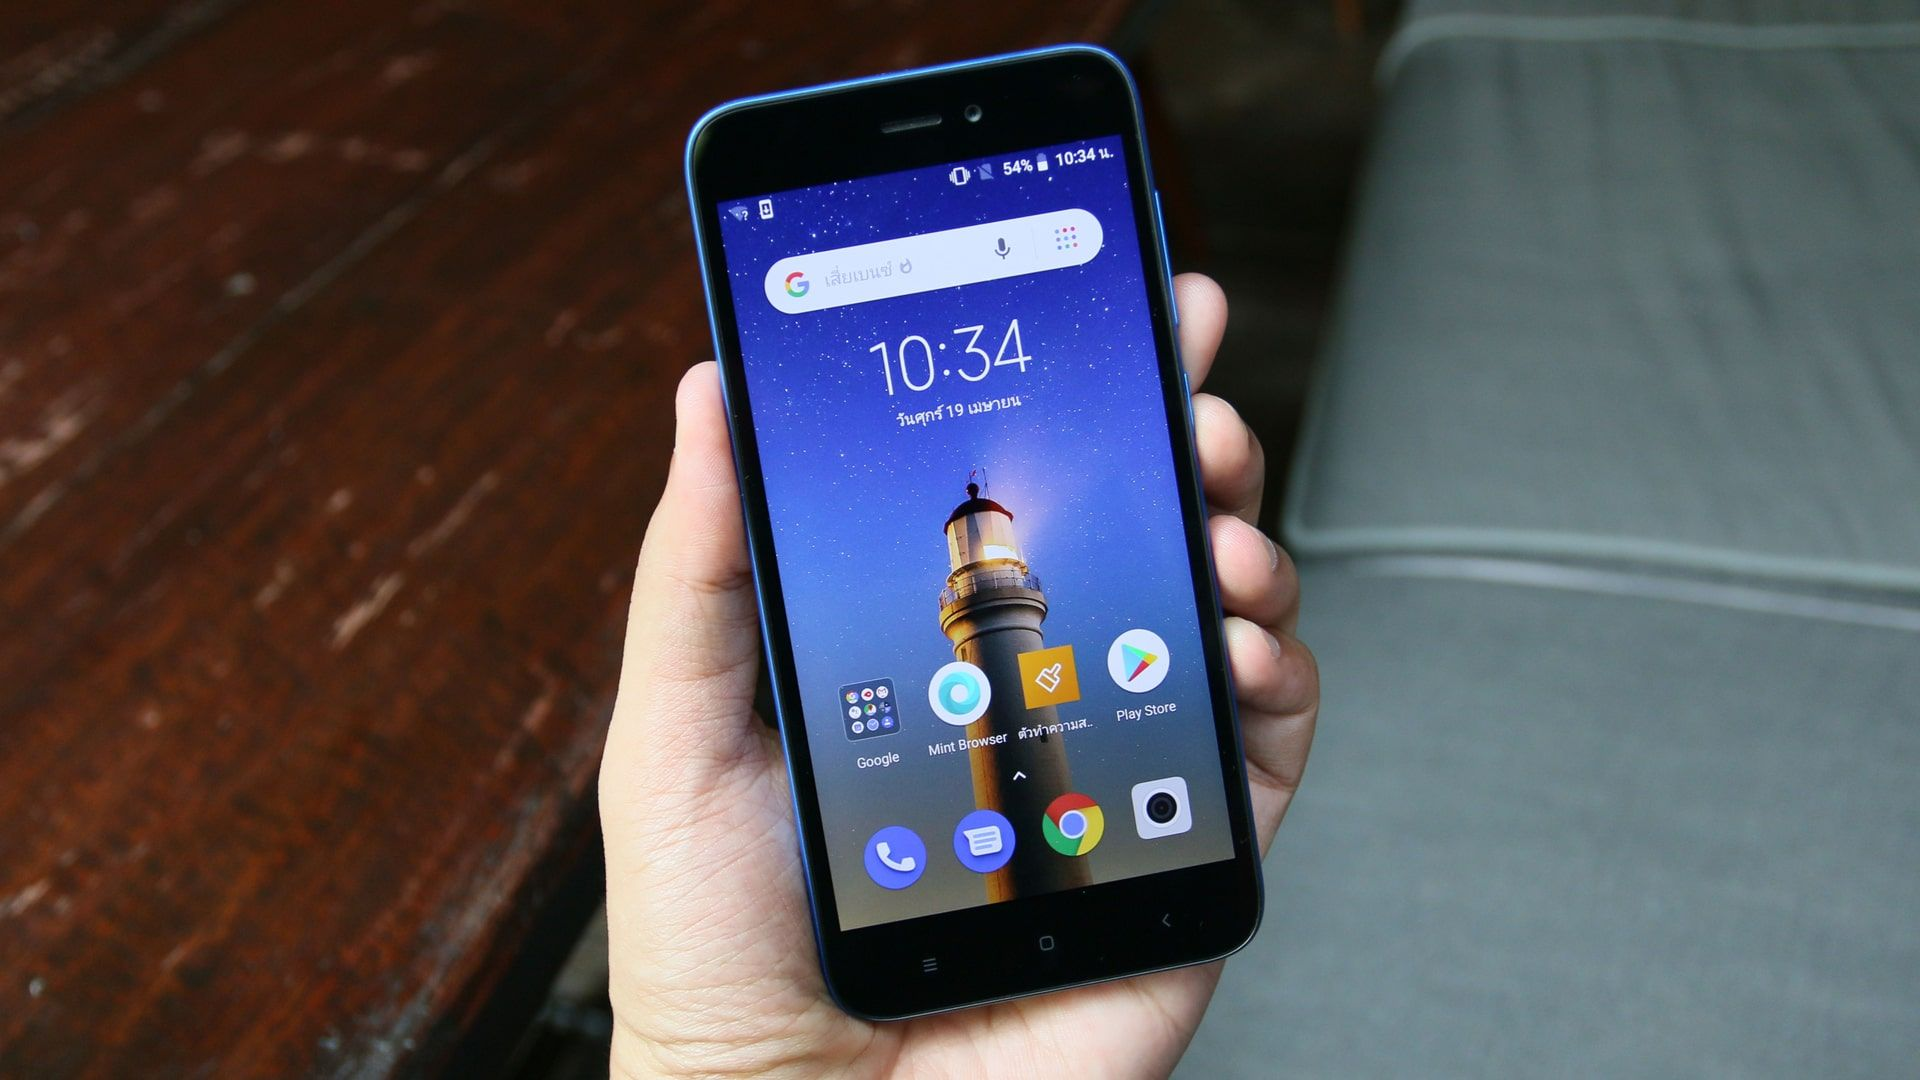 Redmi Go roda Android Oreo na versão Go (Foto: Shutterstock)